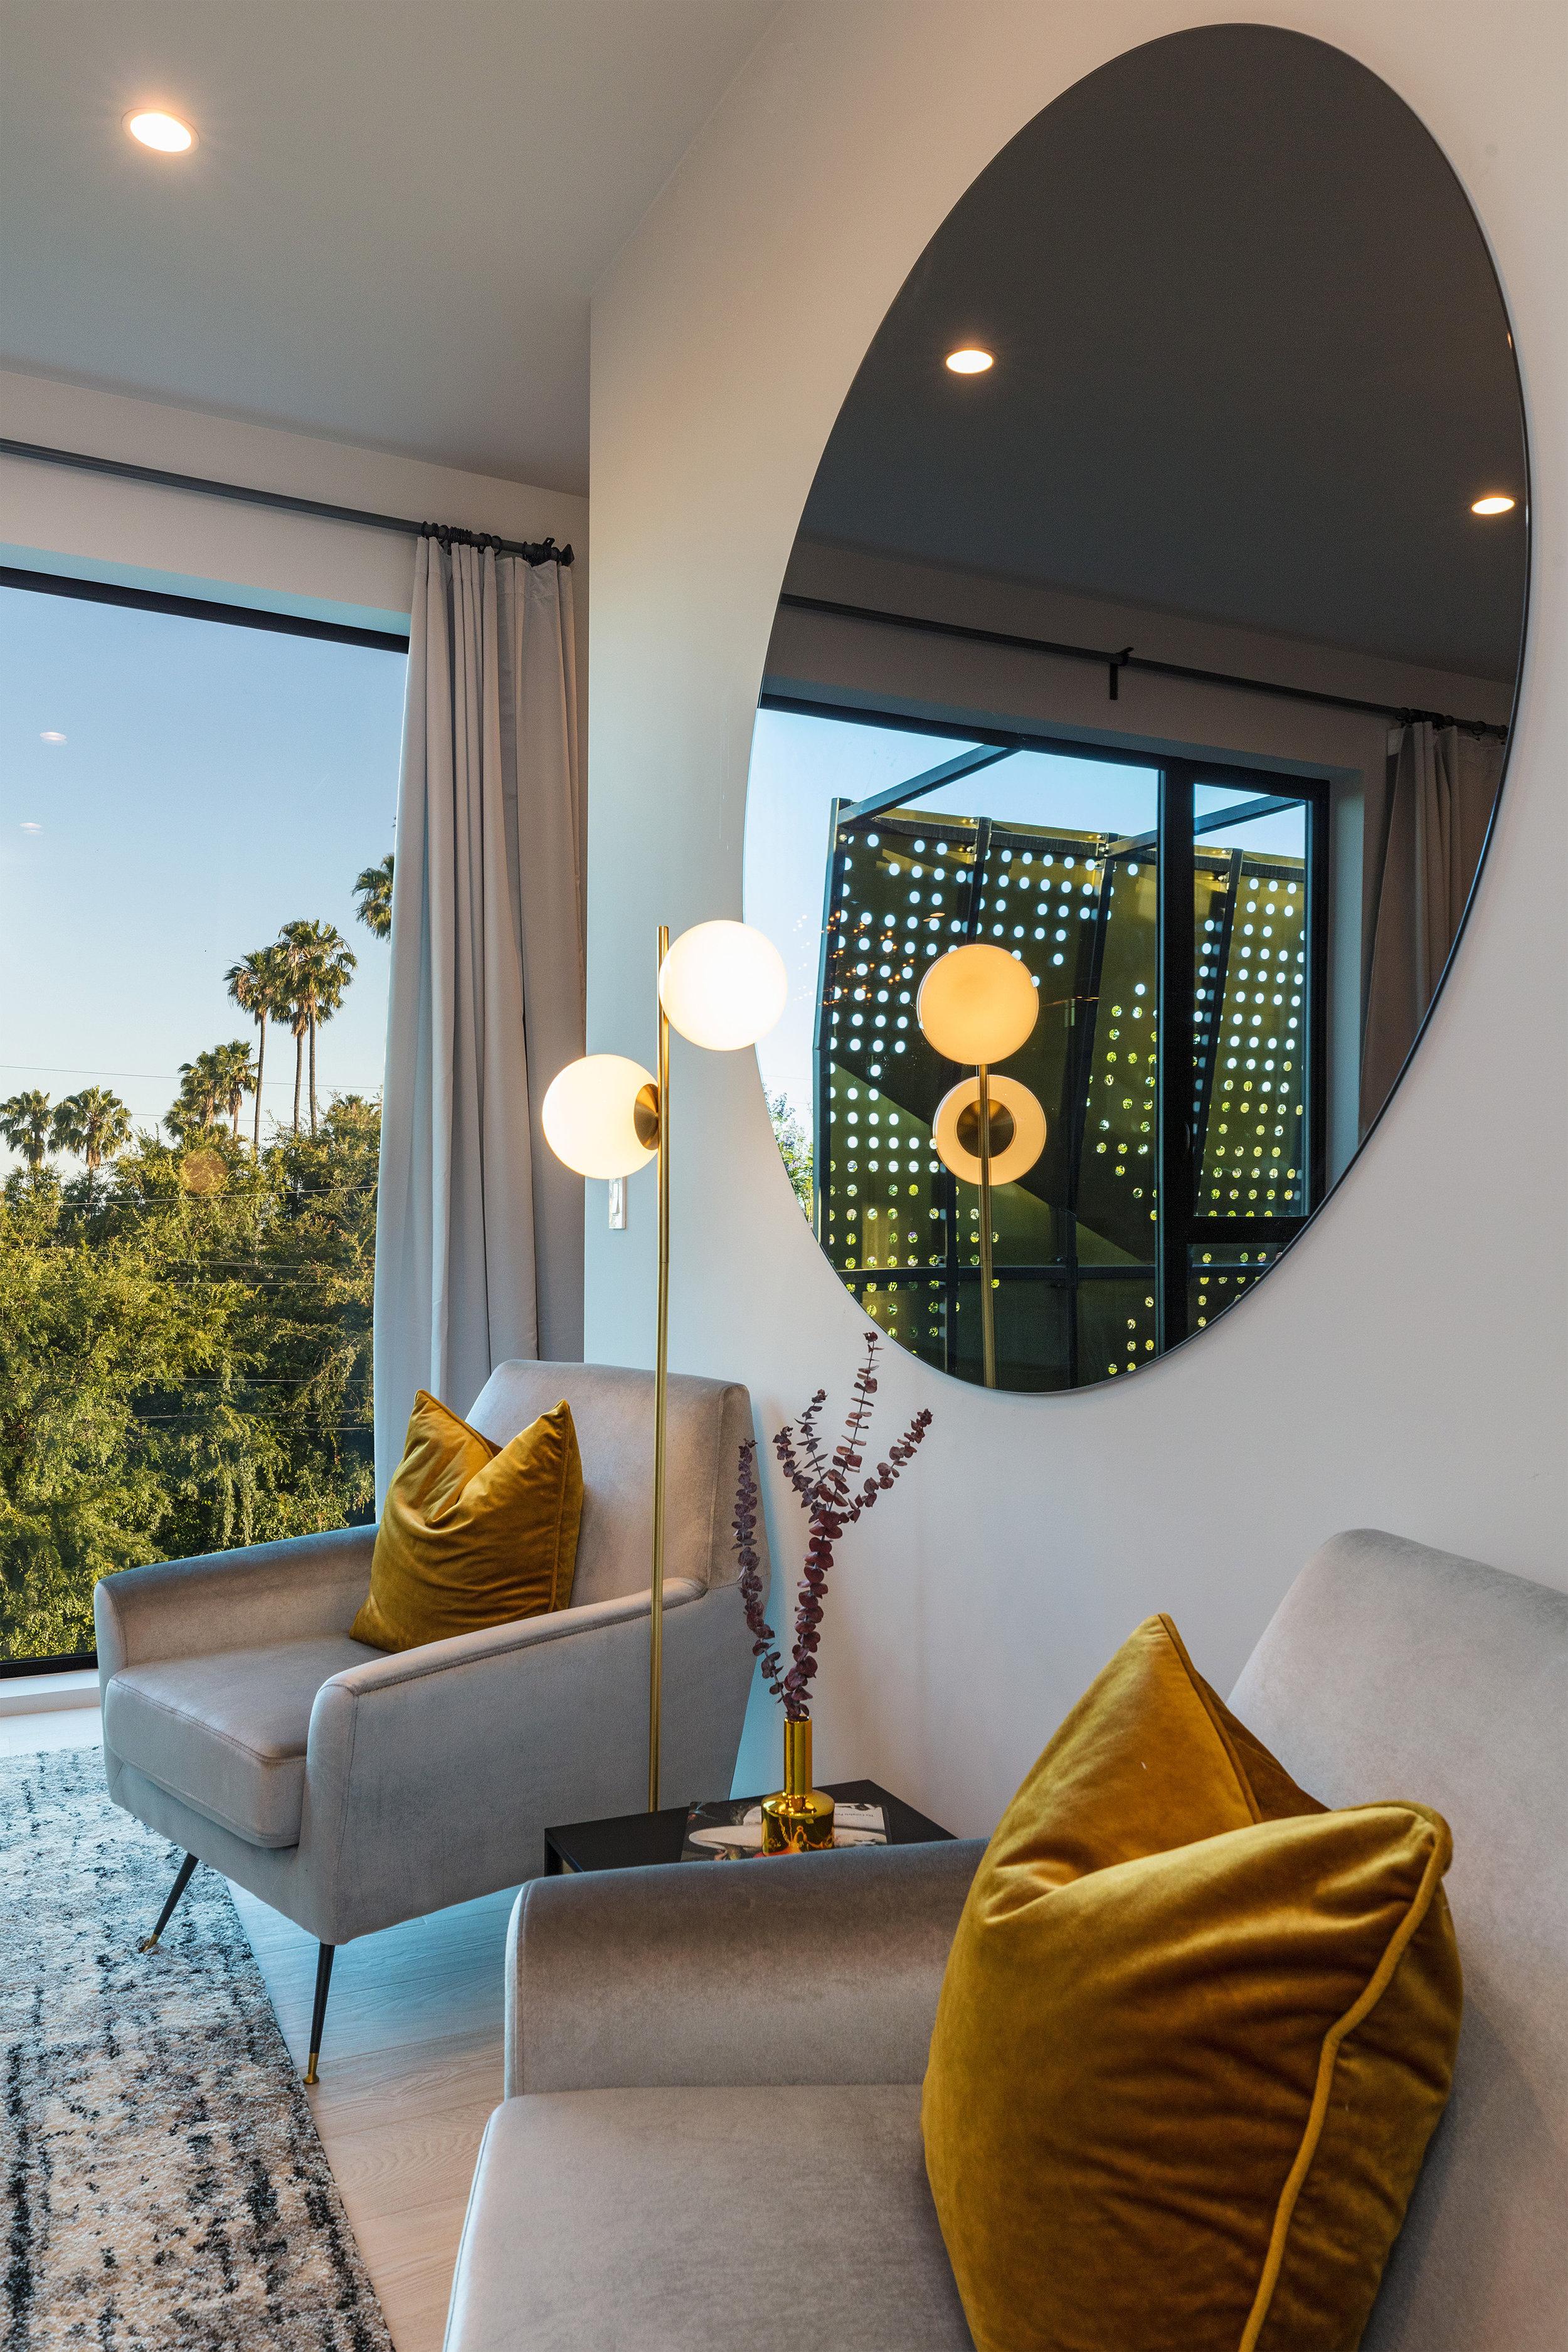 Master Suite - ·en-suite SPA·Walk-IN wardrobe·Dual outdoor patios·inSPIRING viewsA surprising reveal brings commanding views inside. Relax royally.